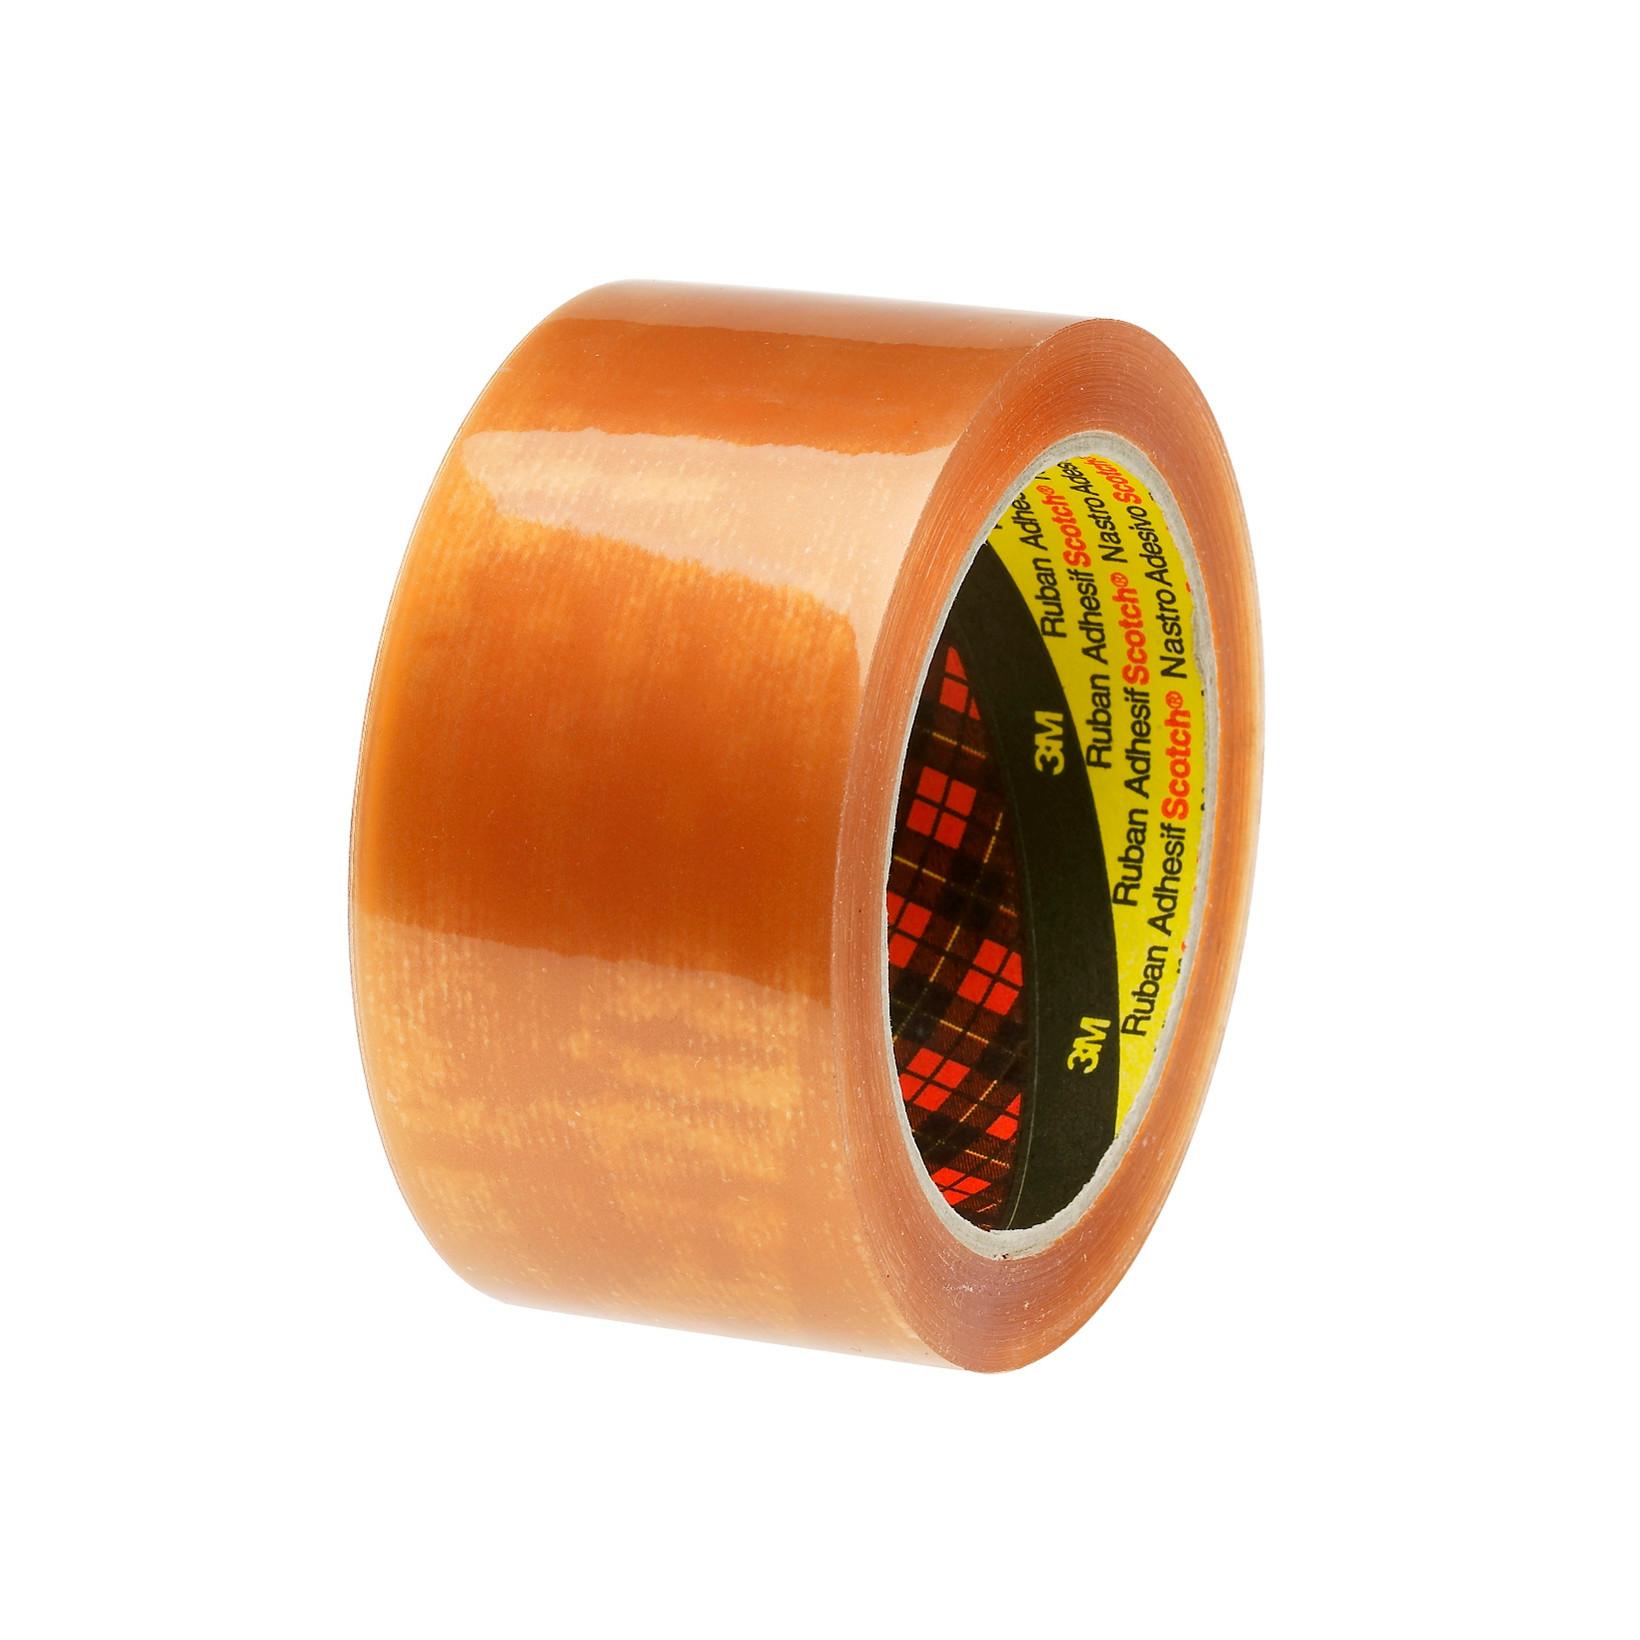 3M tape 3701 scotch solvent - 48 mm x 66 m